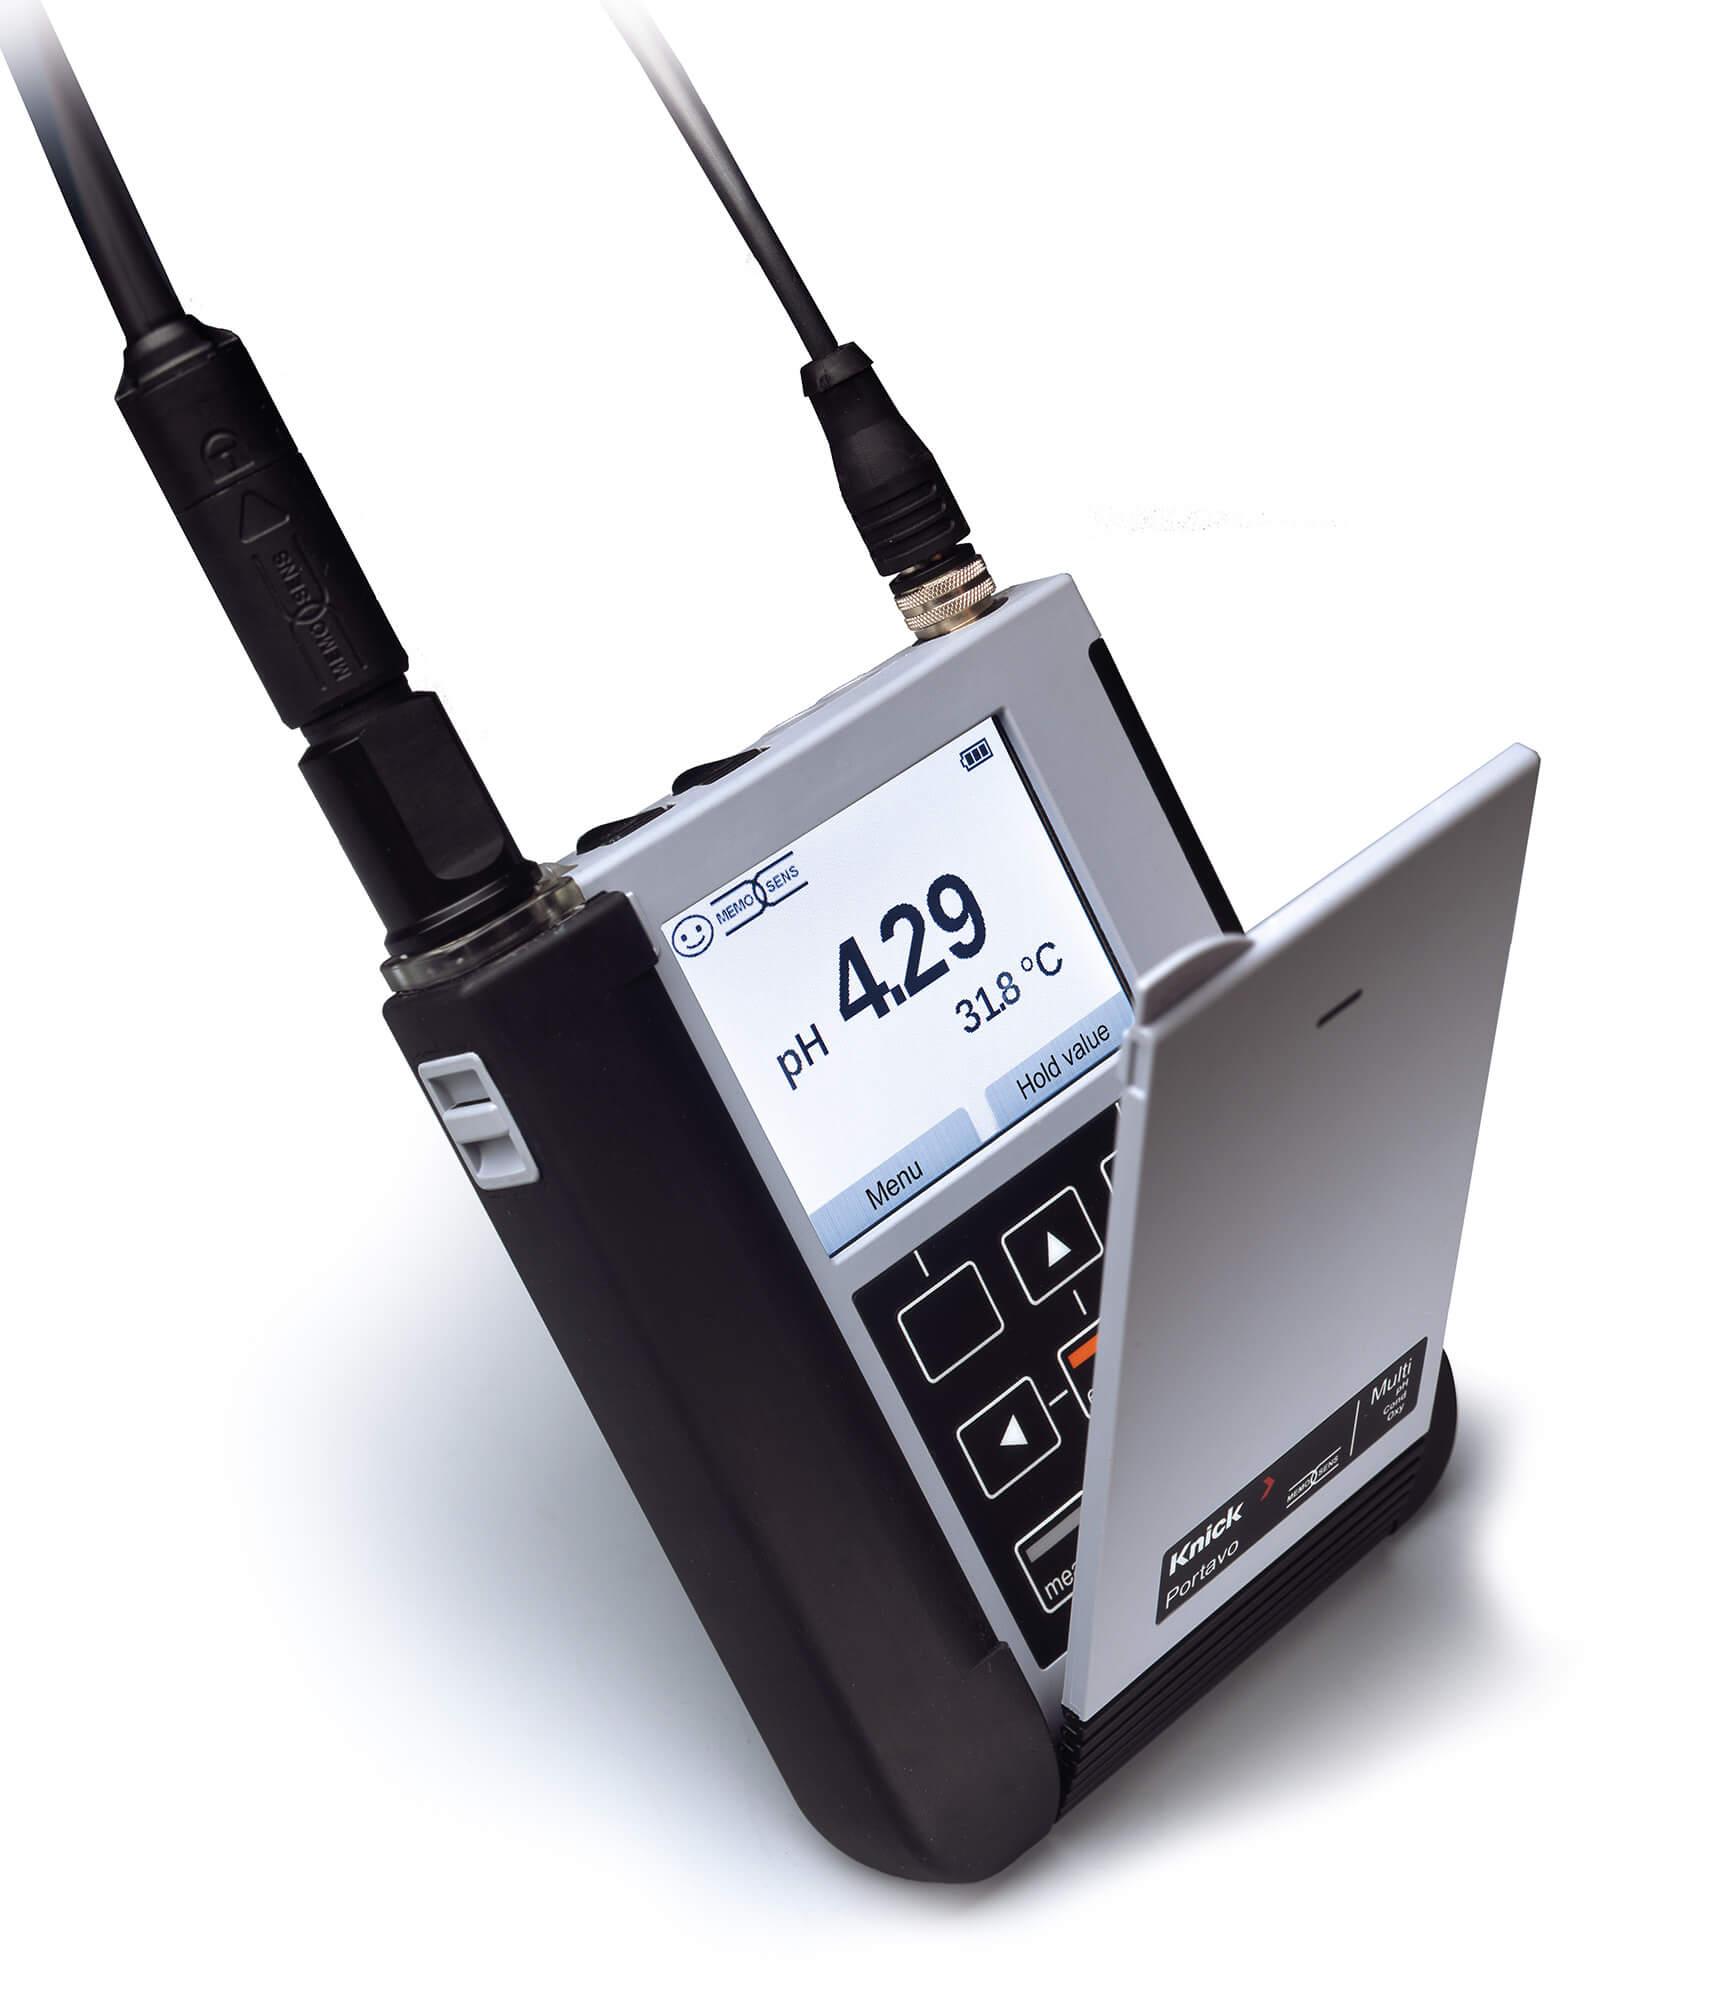 Portavo 904X (Liquiline To Go Ex CYM291- Endress & Hauser)